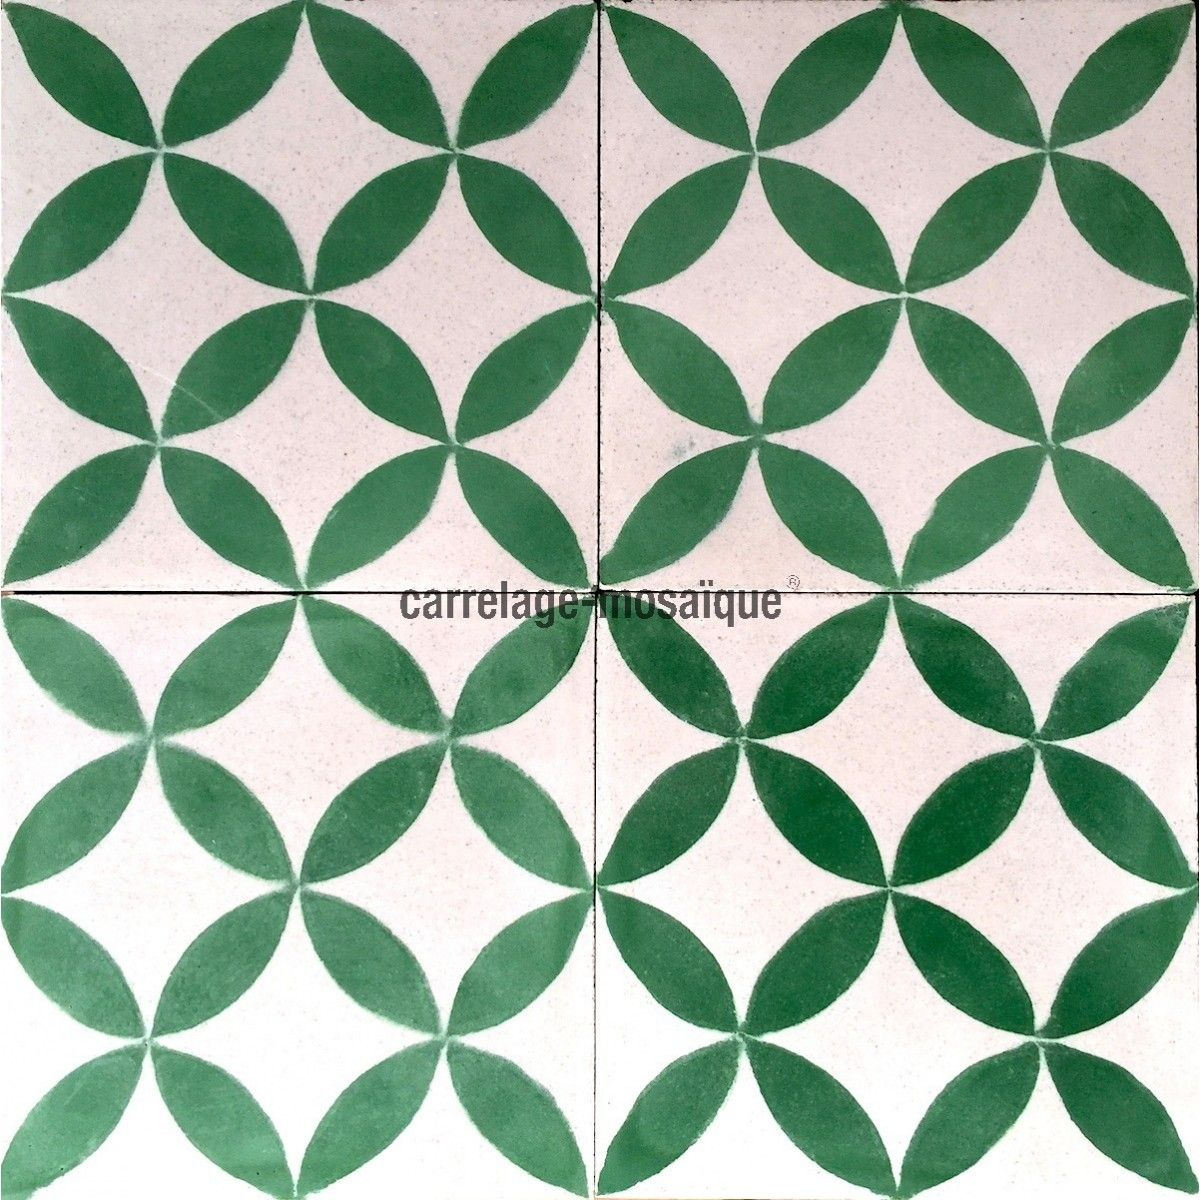 Carreau ciment 1m2 modele sampa vert carrelage mosaique carrelage et carreaux ciment tiles - Mosaique et carrelage ...